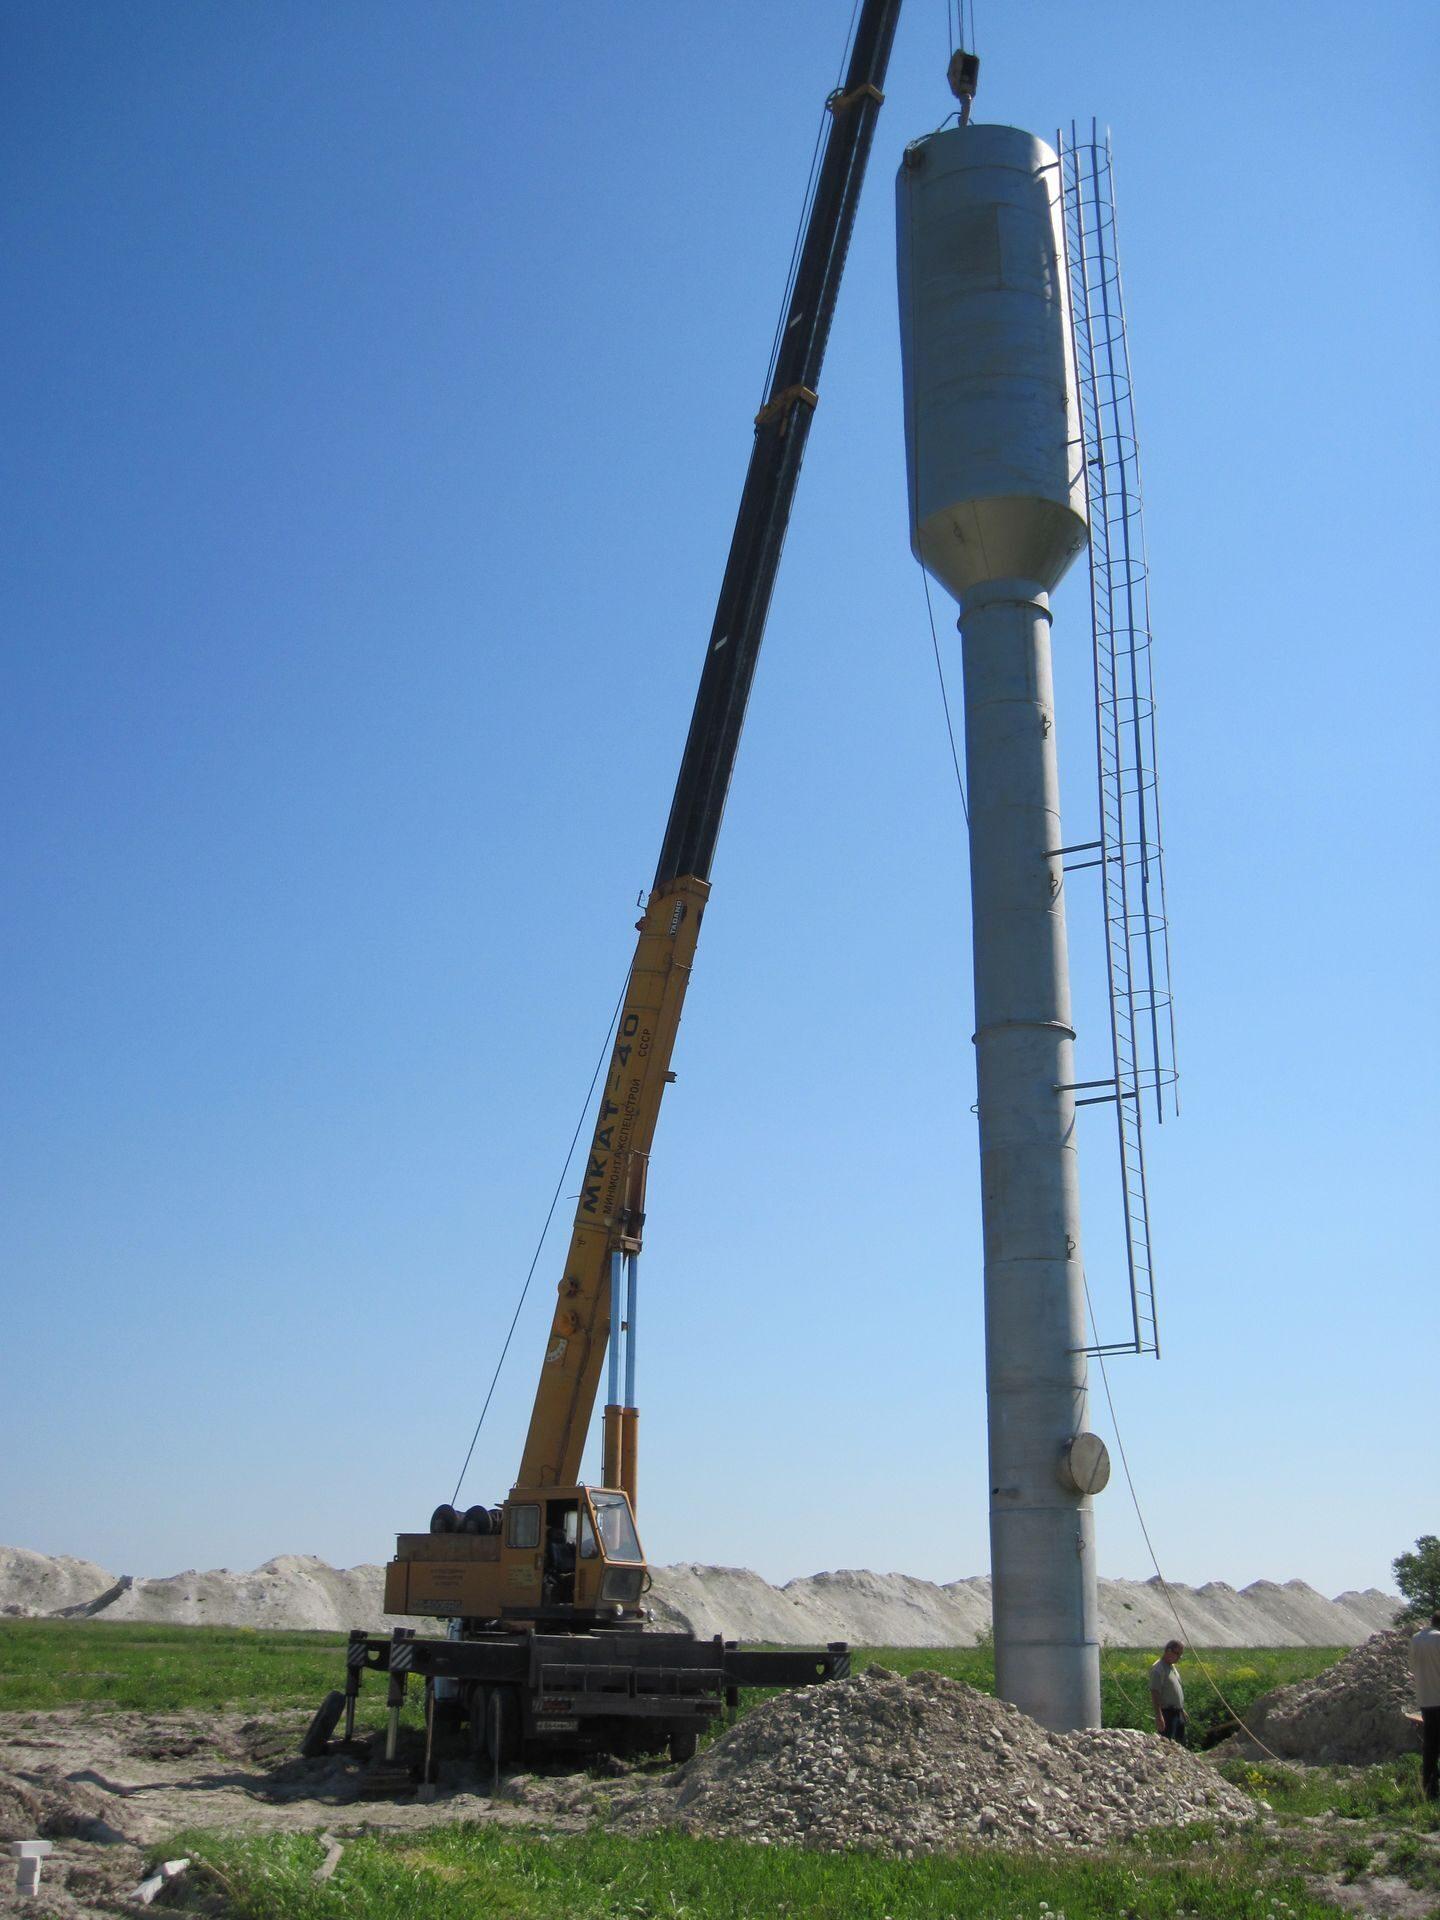 Vмонтаж водонапорной башни